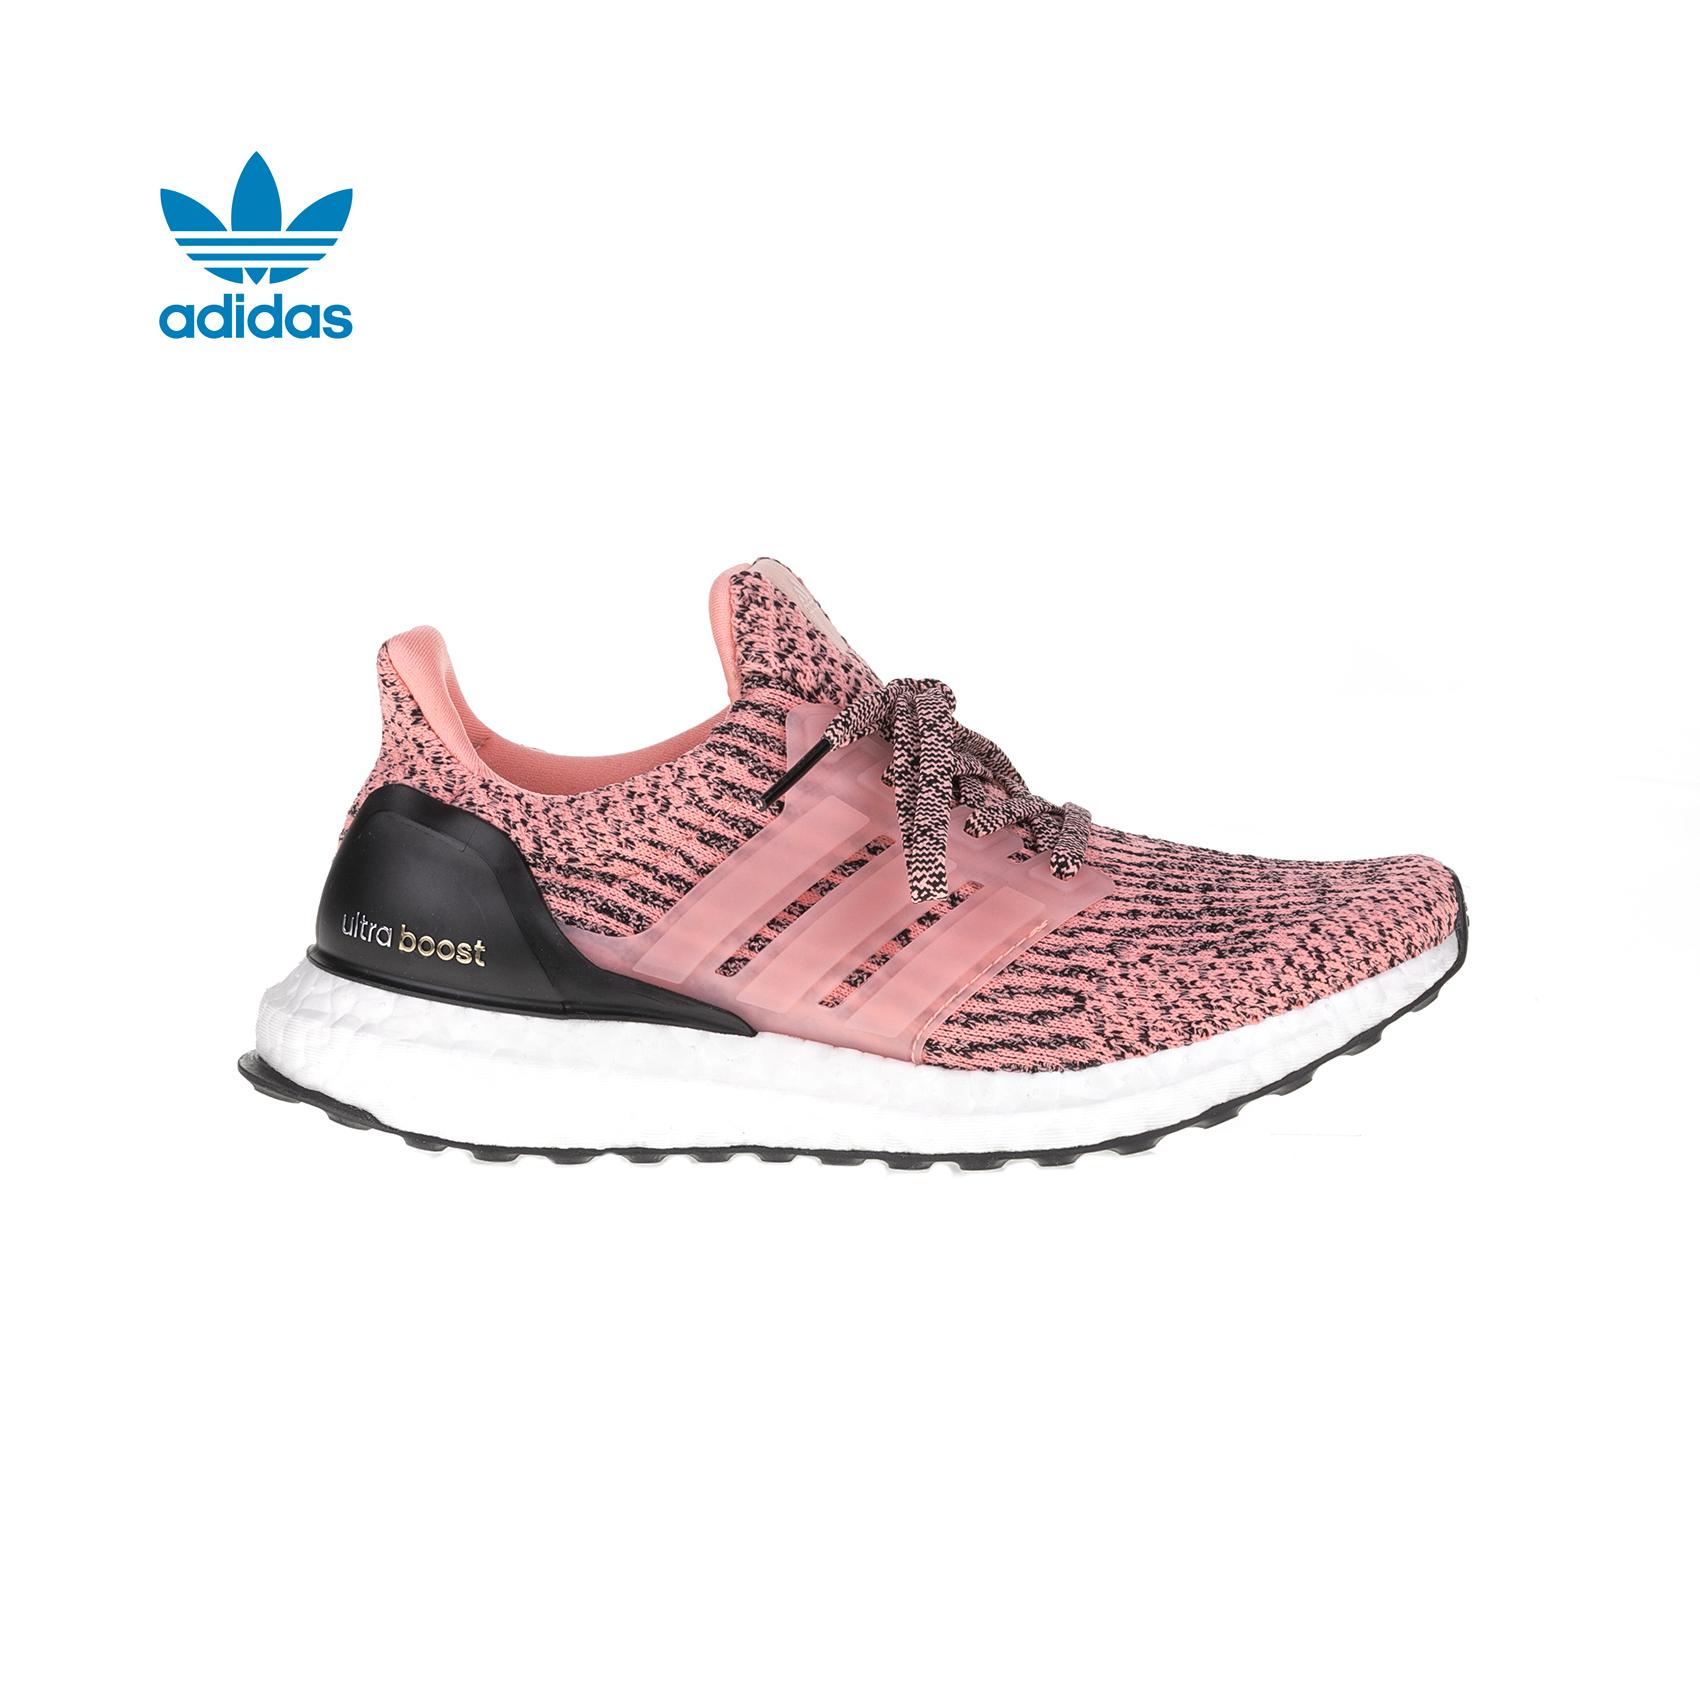 -37% adidas Originals – Γυναικεία παπούτσια adidas UltraBOOST ροζ 4b845fb2150